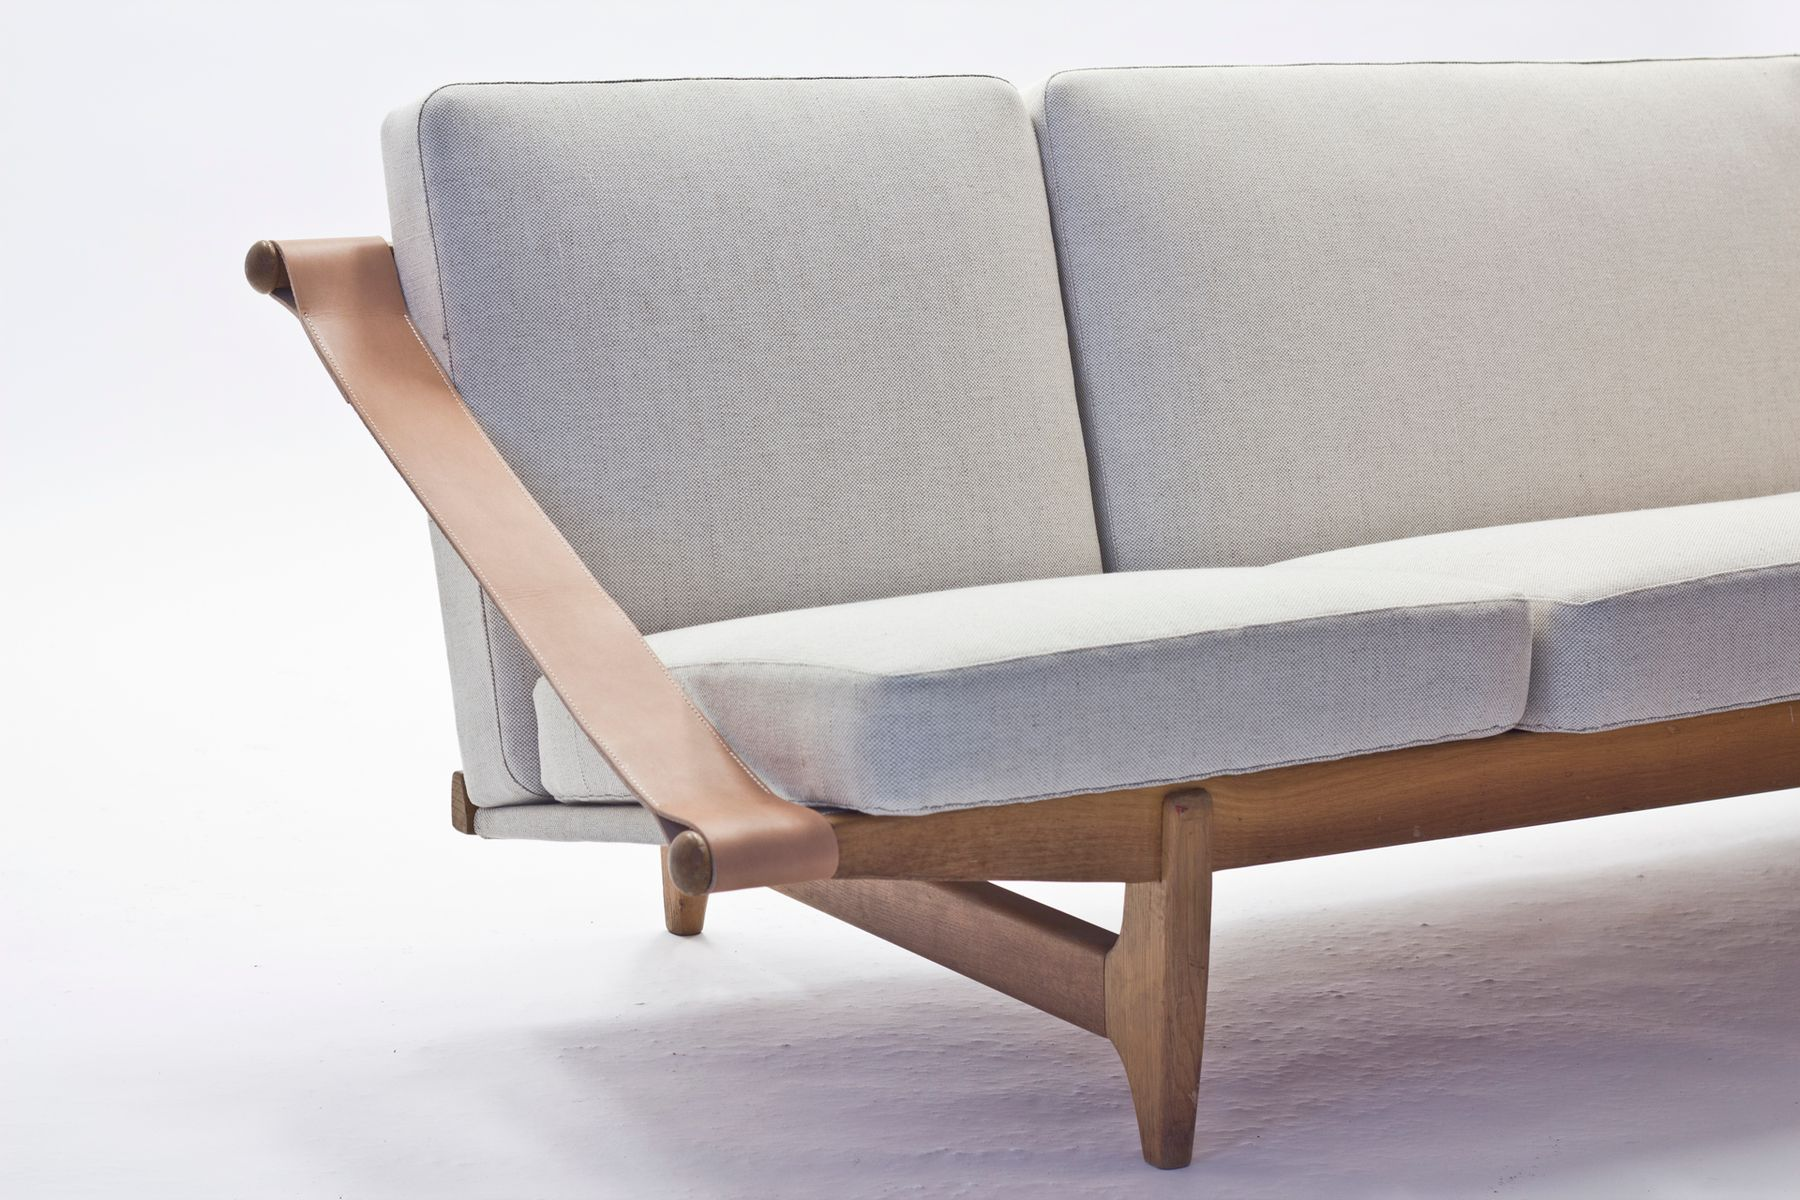 skandinavisches safari stil sofa 1950er bei pamono kaufen. Black Bedroom Furniture Sets. Home Design Ideas